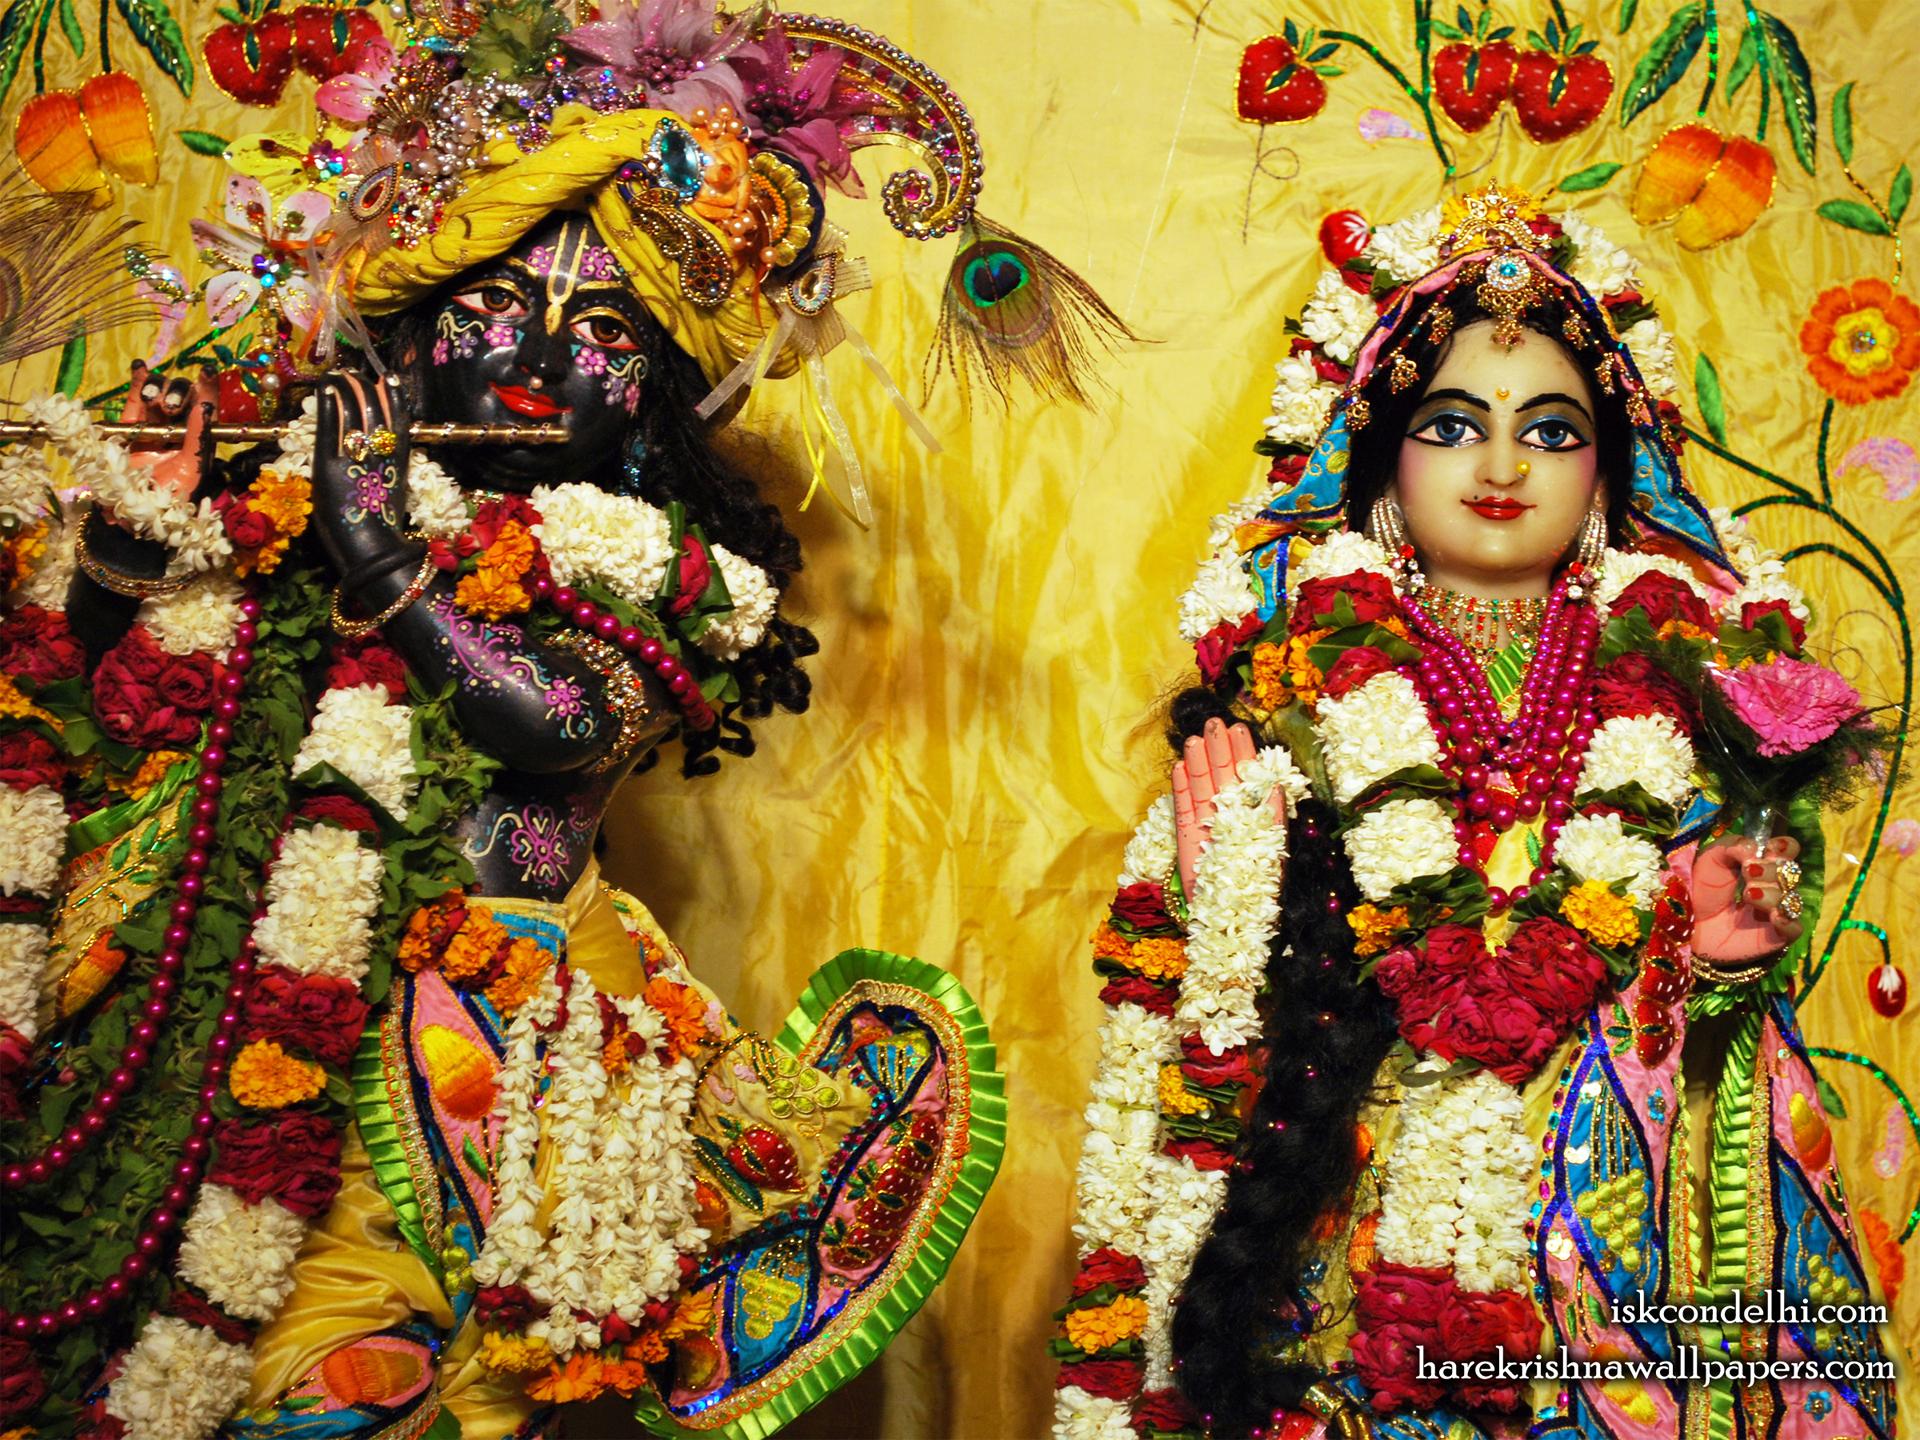 Sri Sri Radha Parthasarathi Close up Wallpaper (011) Size 1920x1440 Download